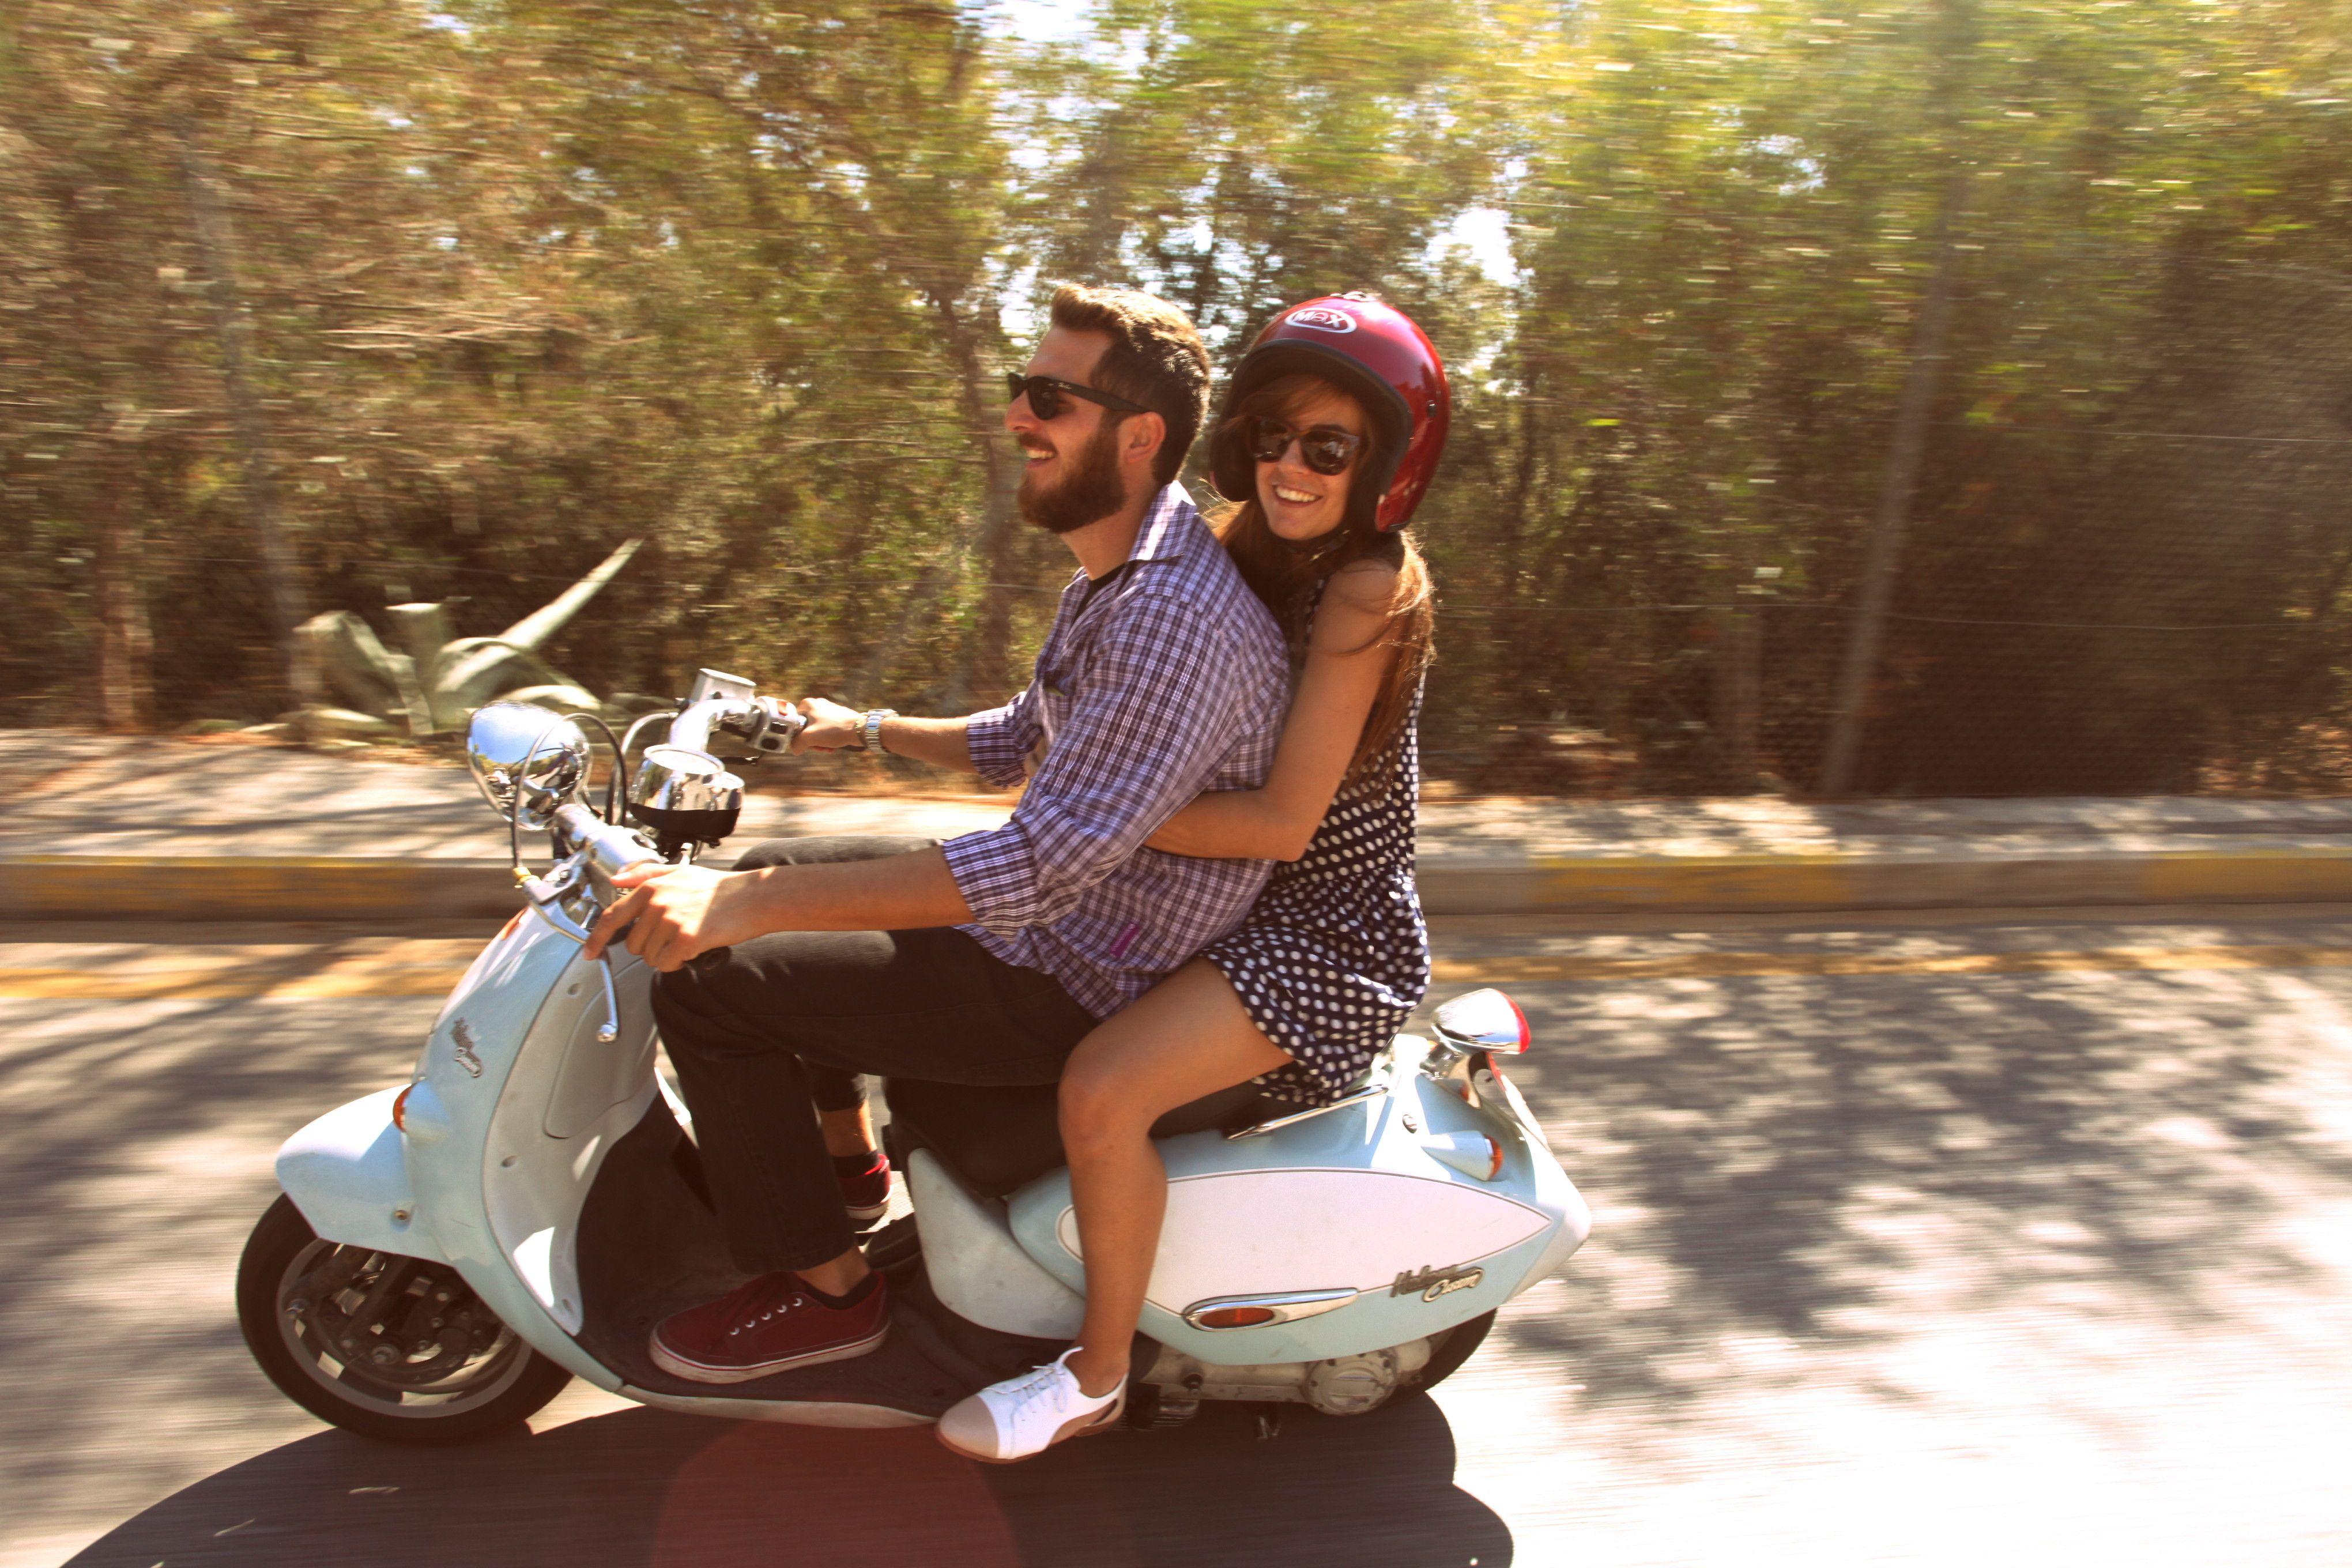 Athens dgr 2013 riding moped